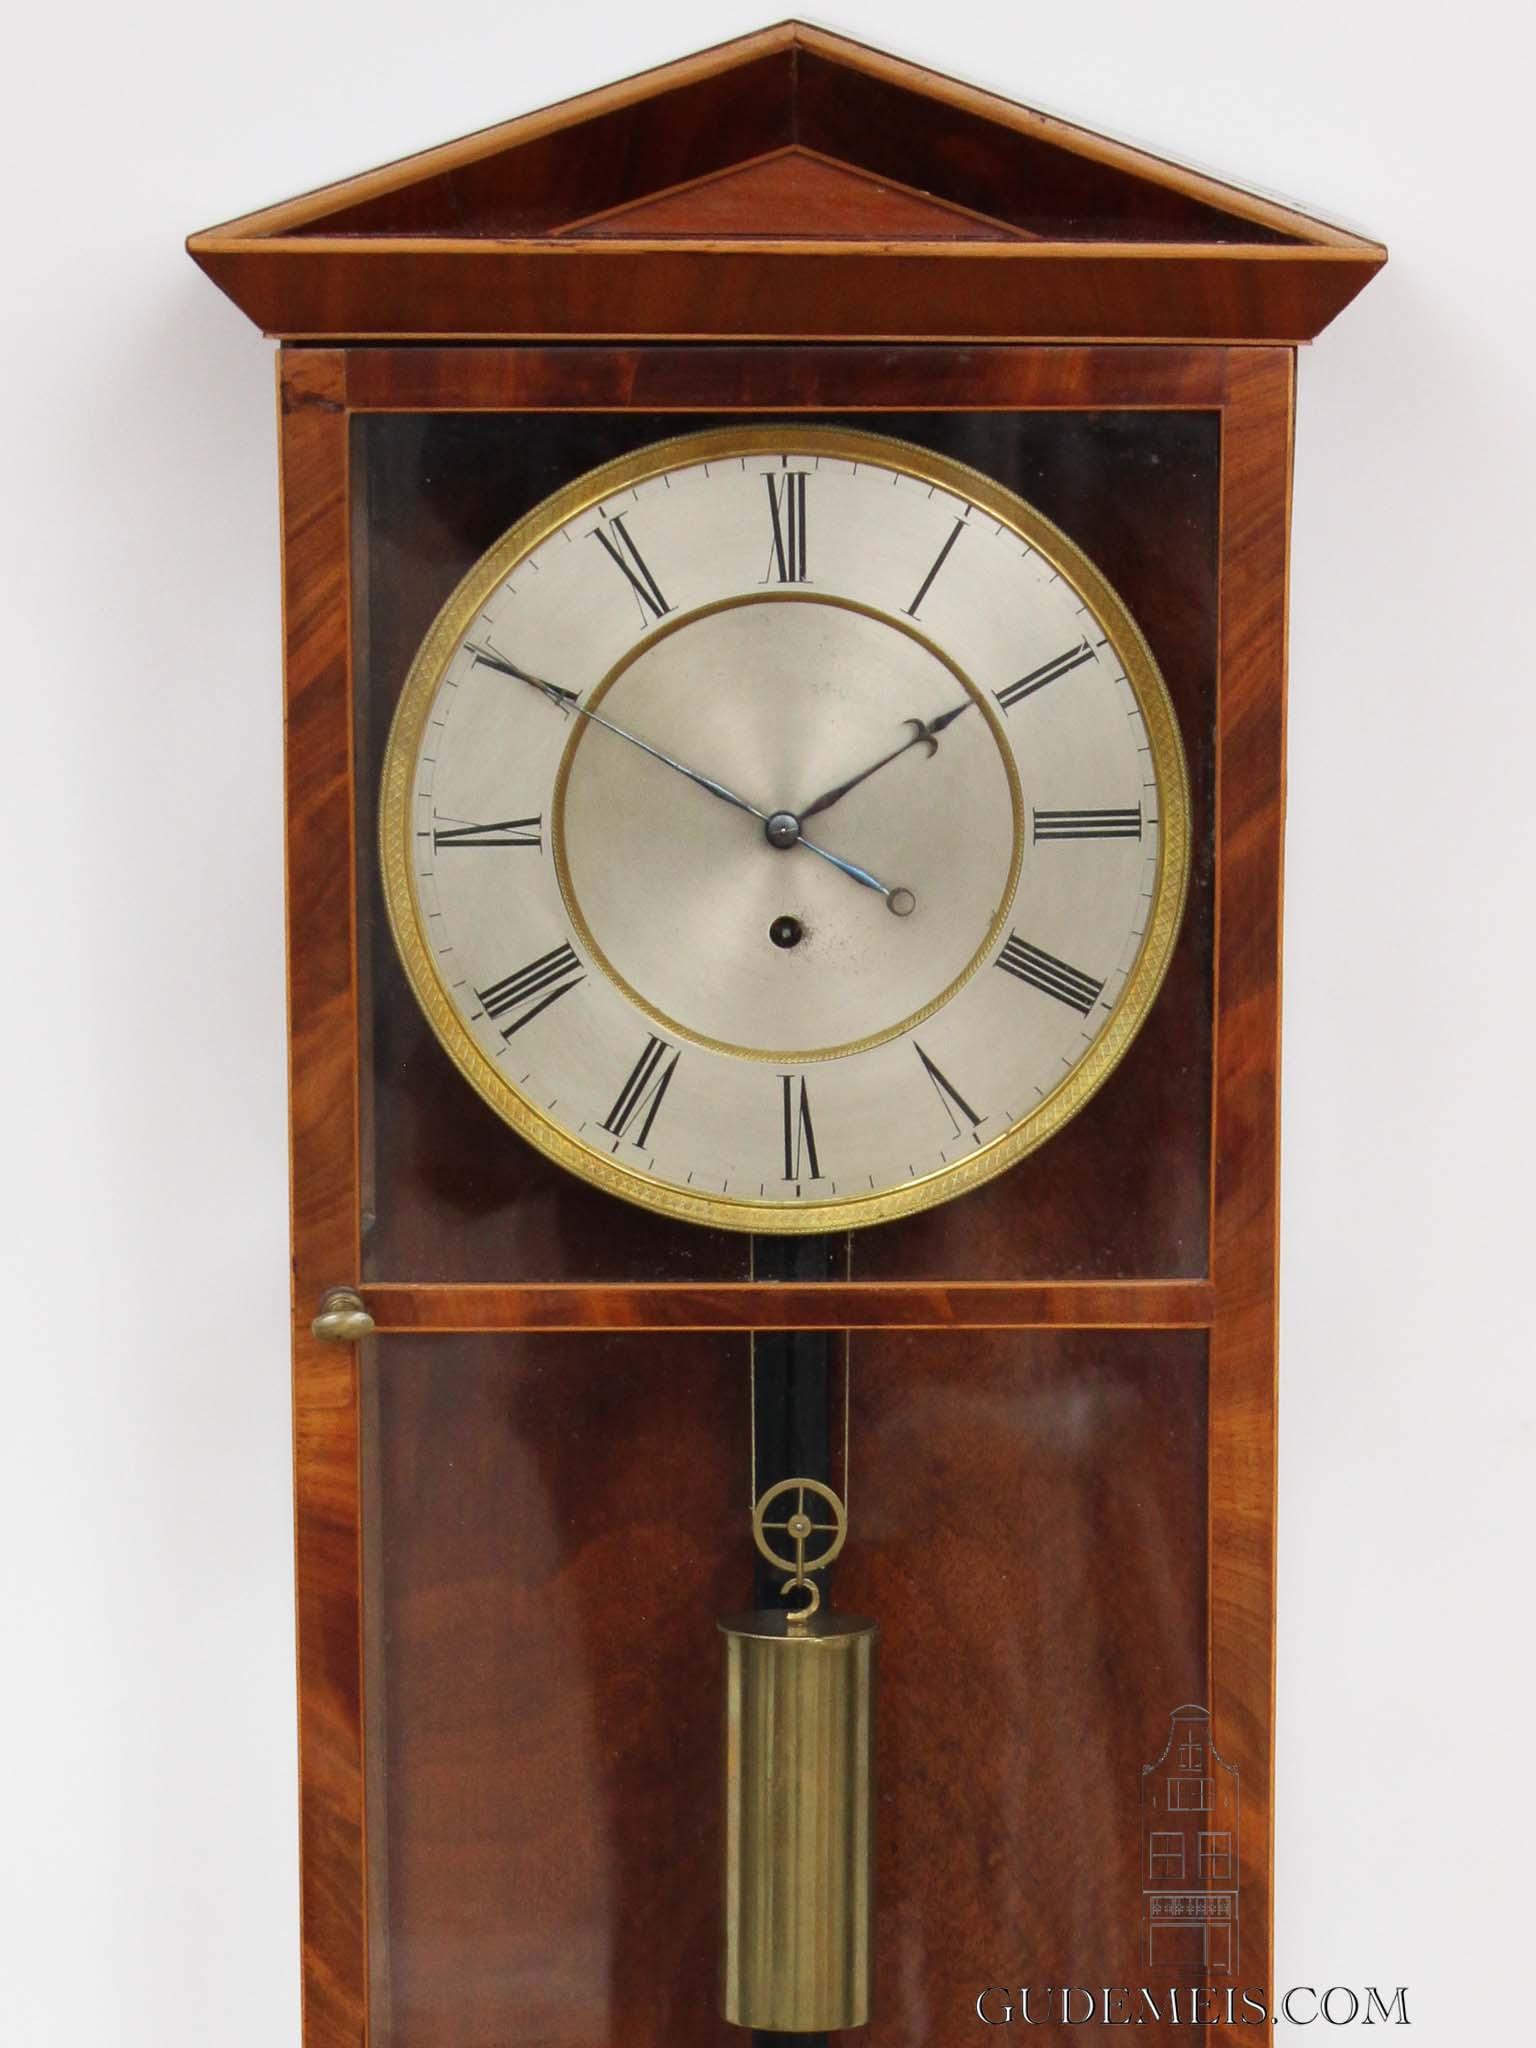 Austrian-Vienna-wien-mahogany-precision-dachluhr-regulator-antique-wall-clock